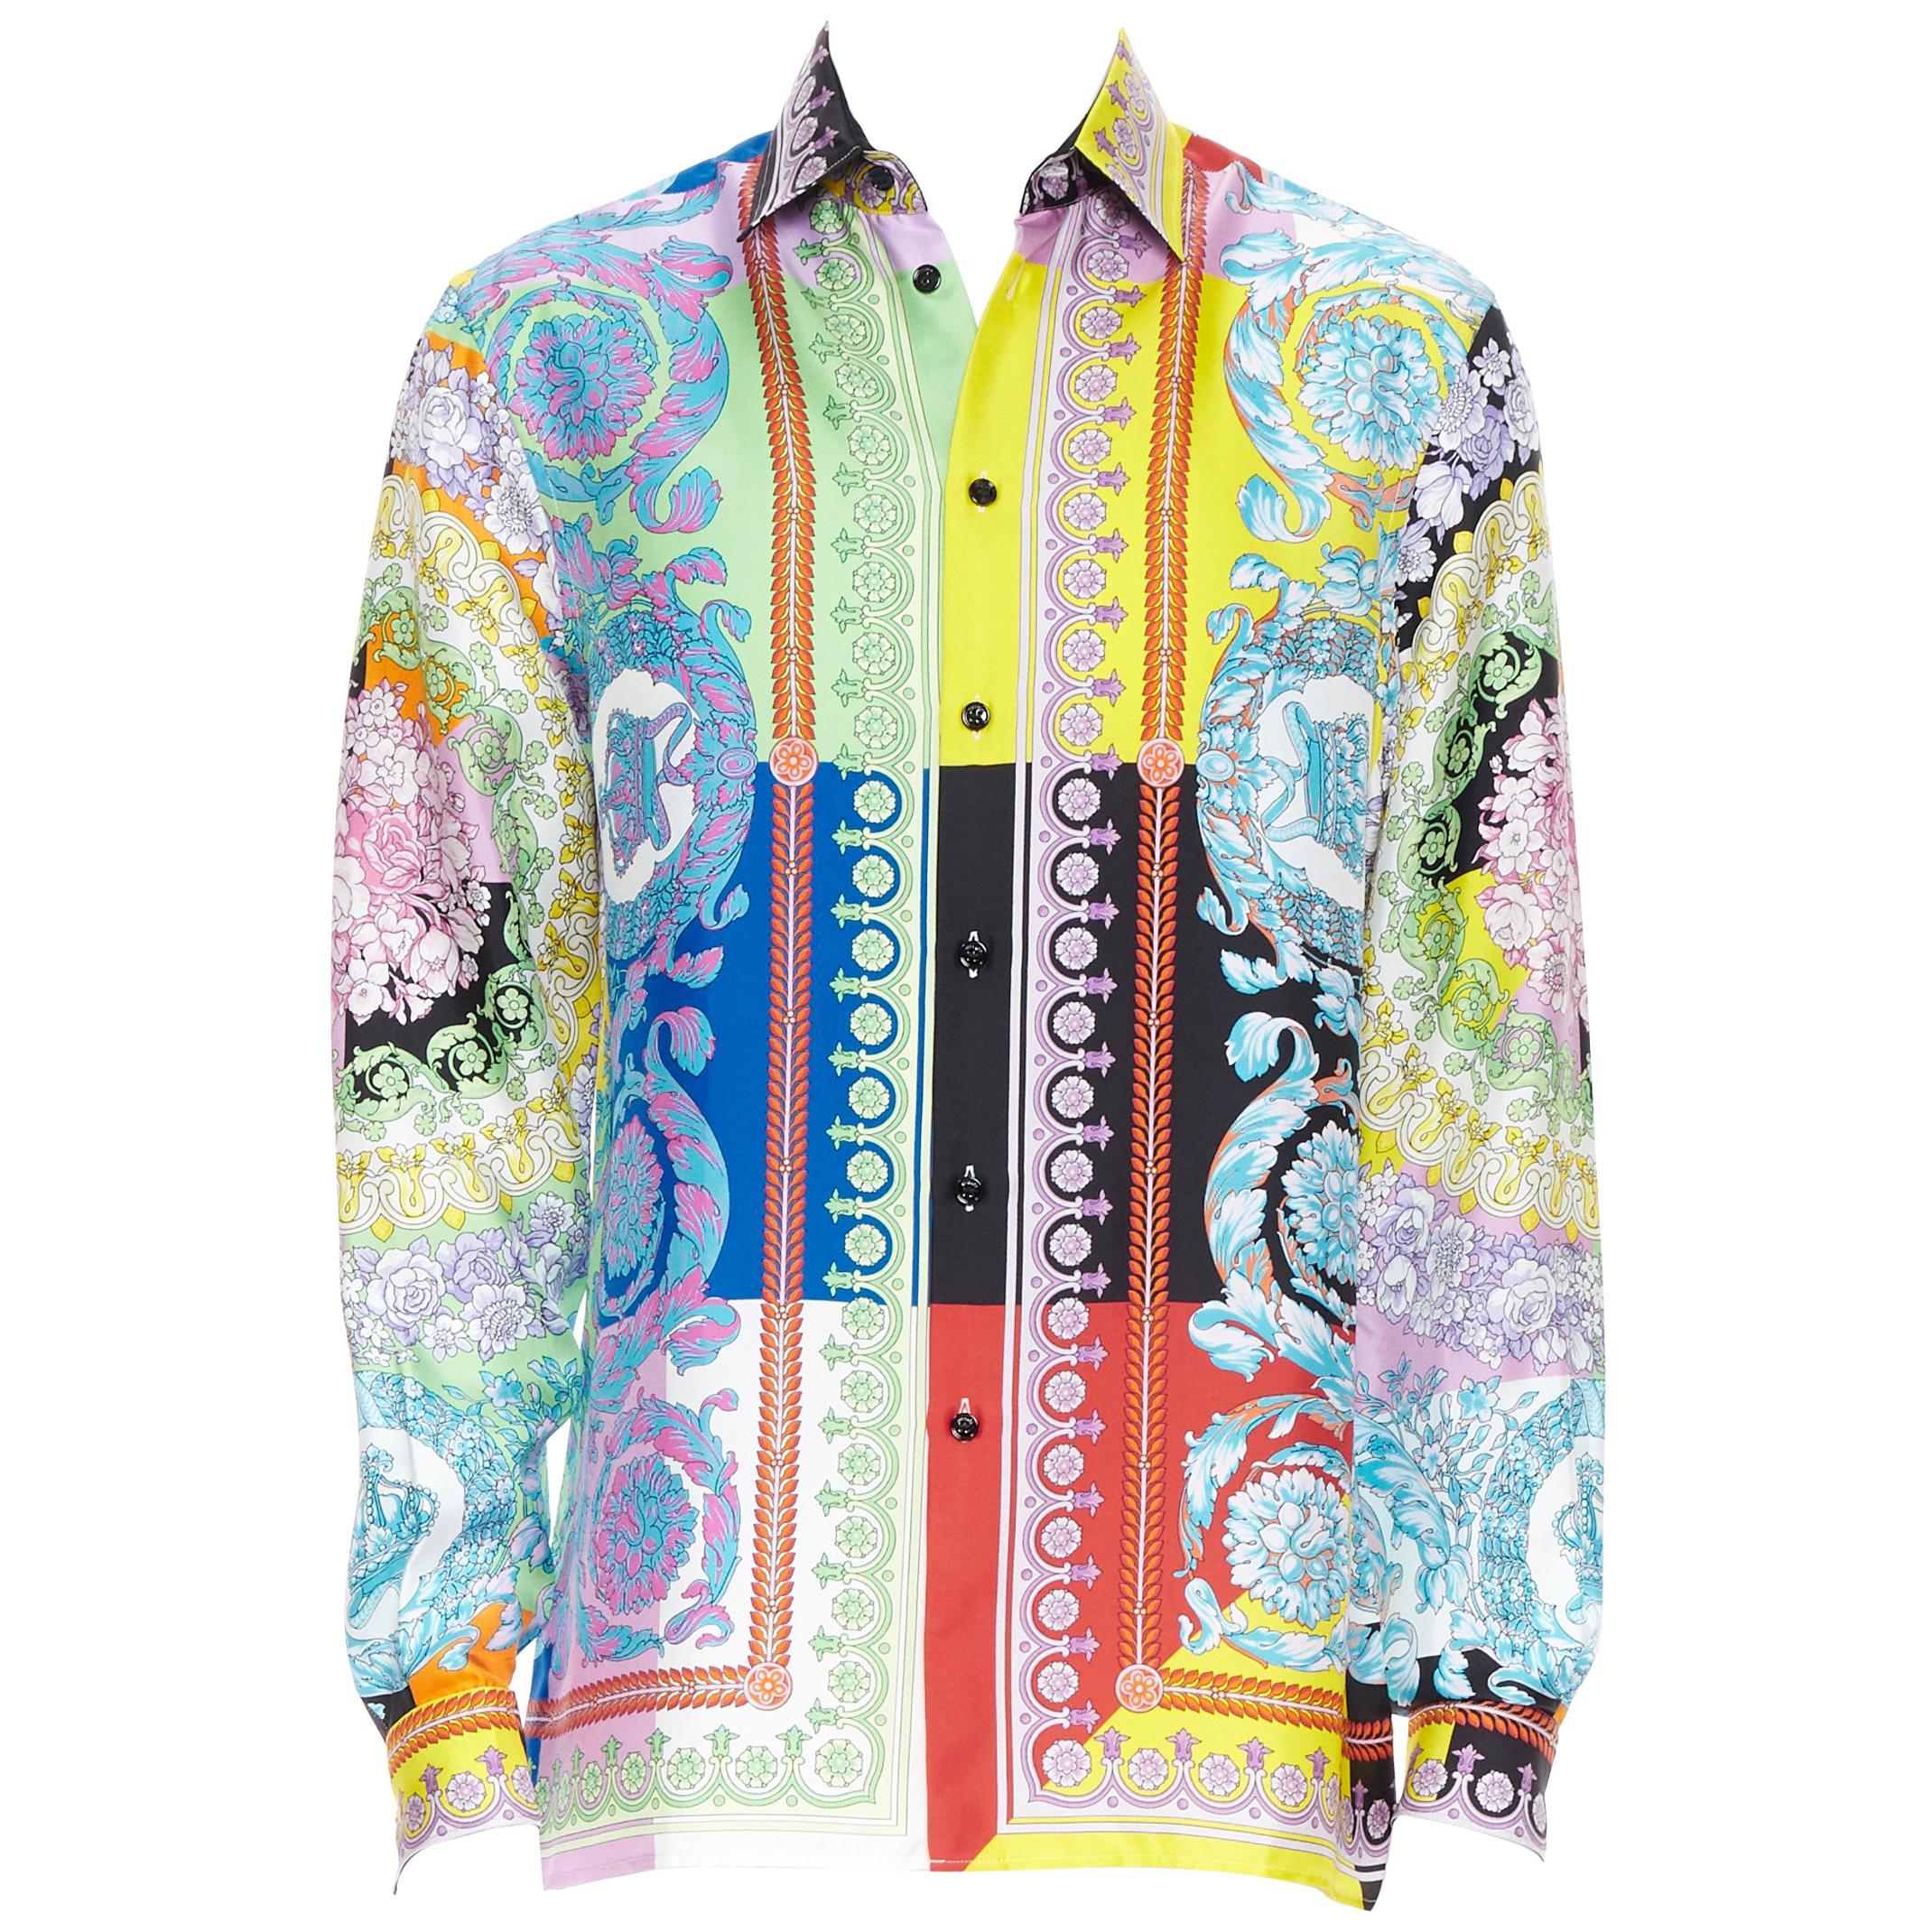 new VERSACE SS19 Techni Baroque floral print 100% silk relaxed  shirt top EU38 S